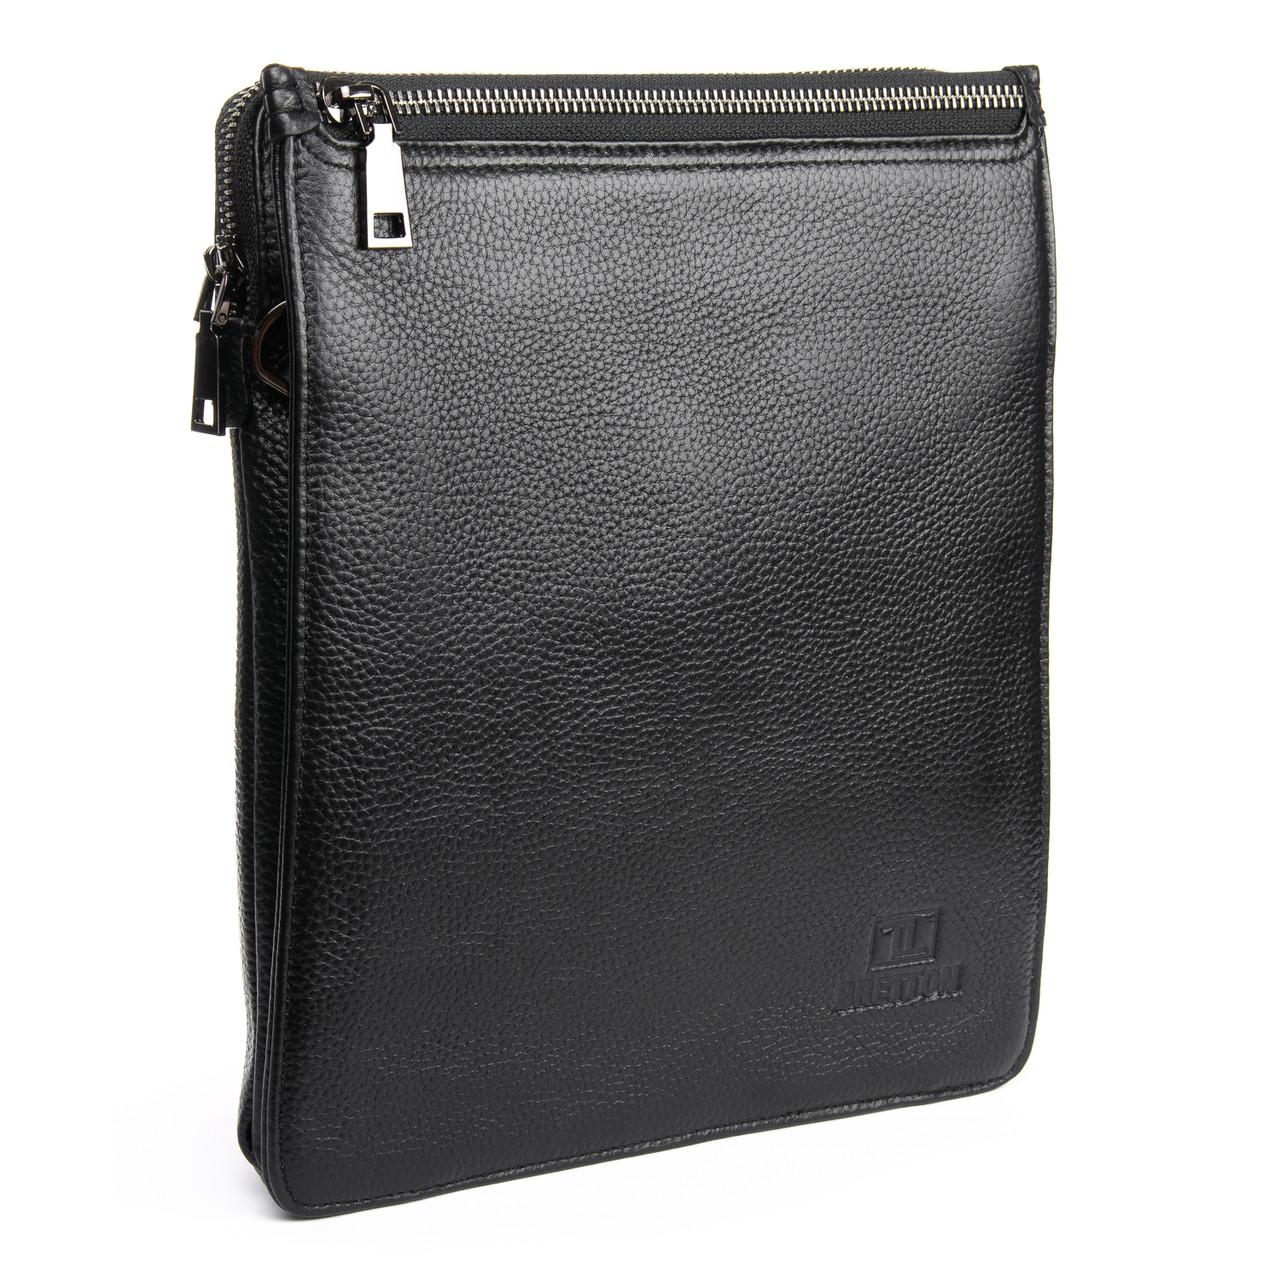 Сумка Мужская Планшет кожаный BRETTON BP 3596-3 черная